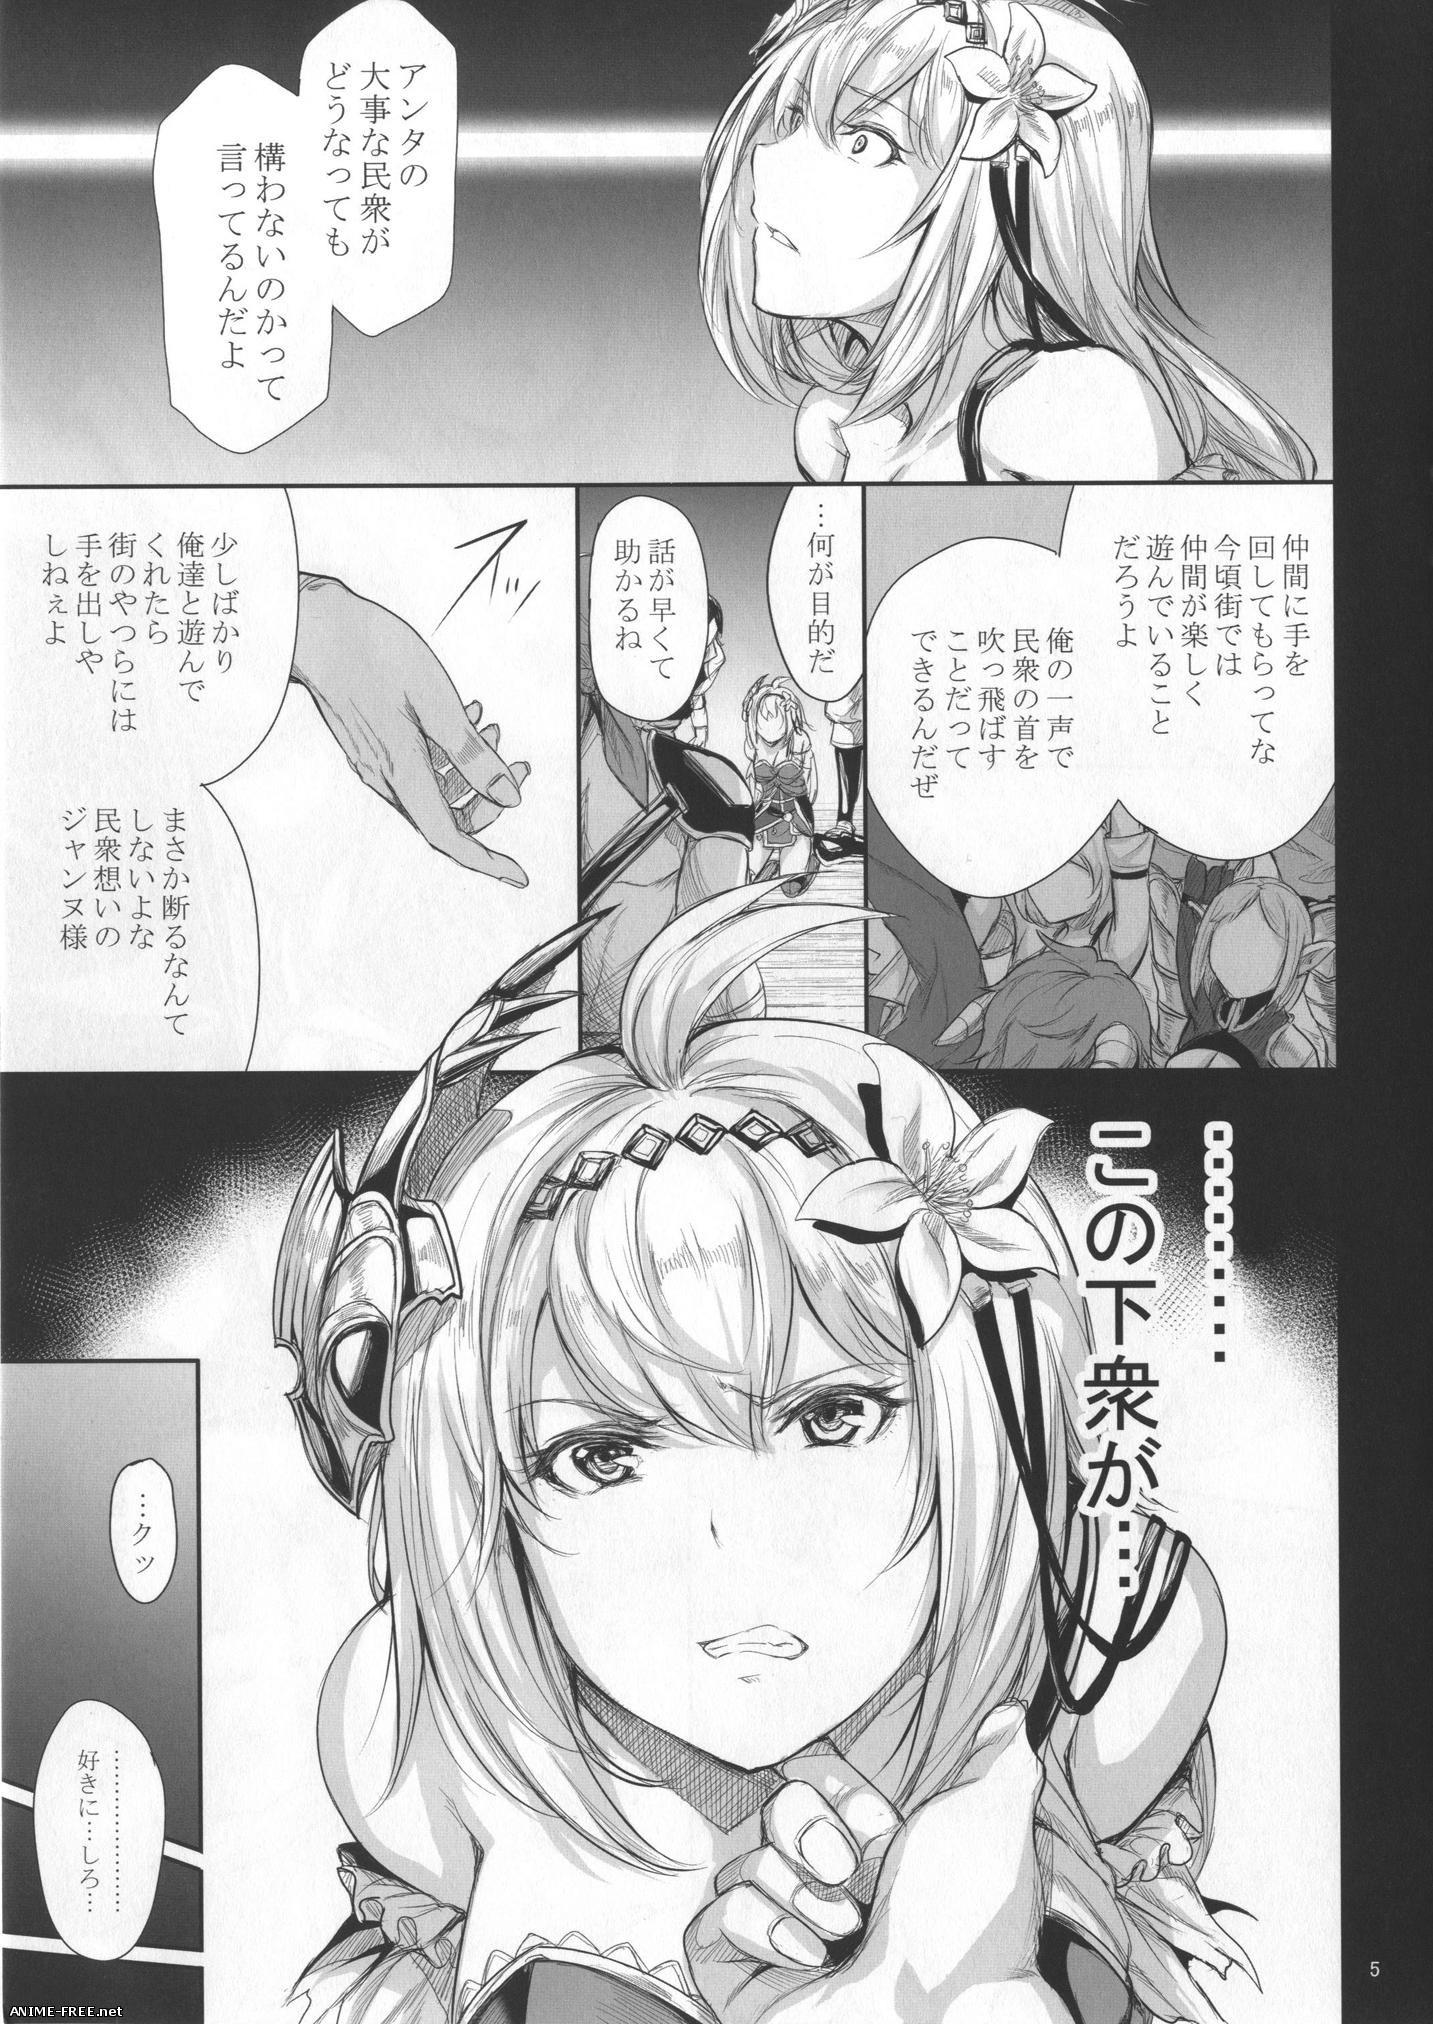 Gentsuki - Сборник хентай манги [Ptcen] [JAP,ENG,RUS] Manga Hentai